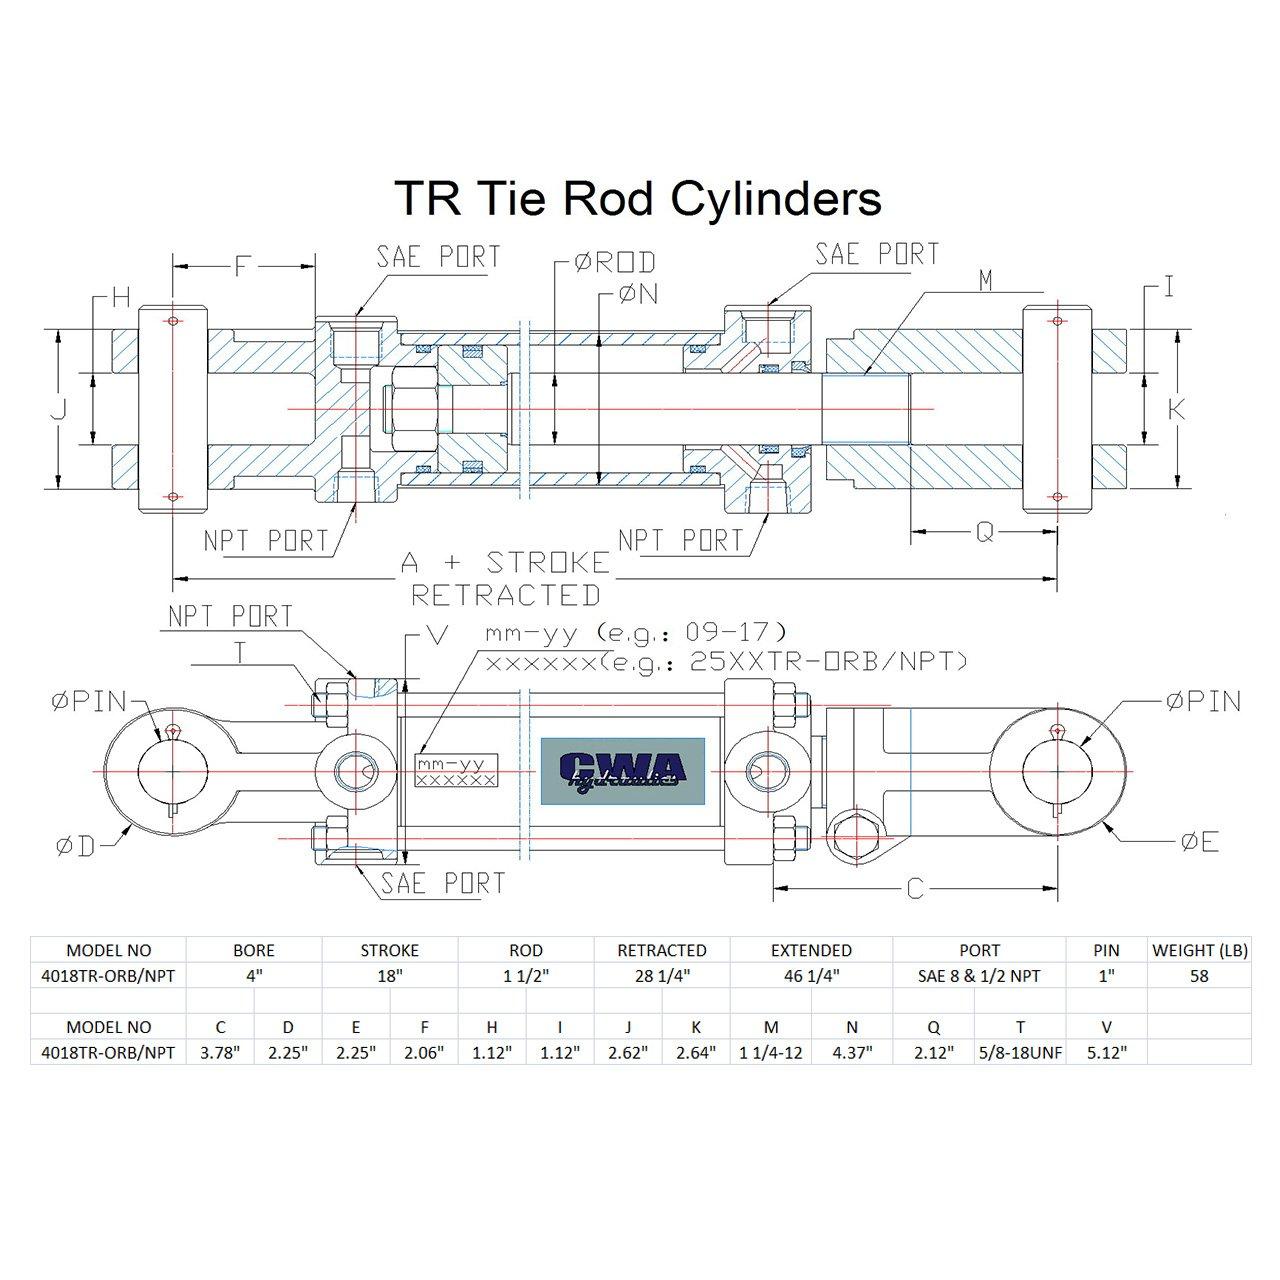 SAE 8 and 1//2 NPT C4018TR-ORB//NPT CWA Hydraulics TR Tie Rod Hydraulic Cylinder 4 Bore x 18 Stroke x 1 1//2 Rod x 2500 PSI Port